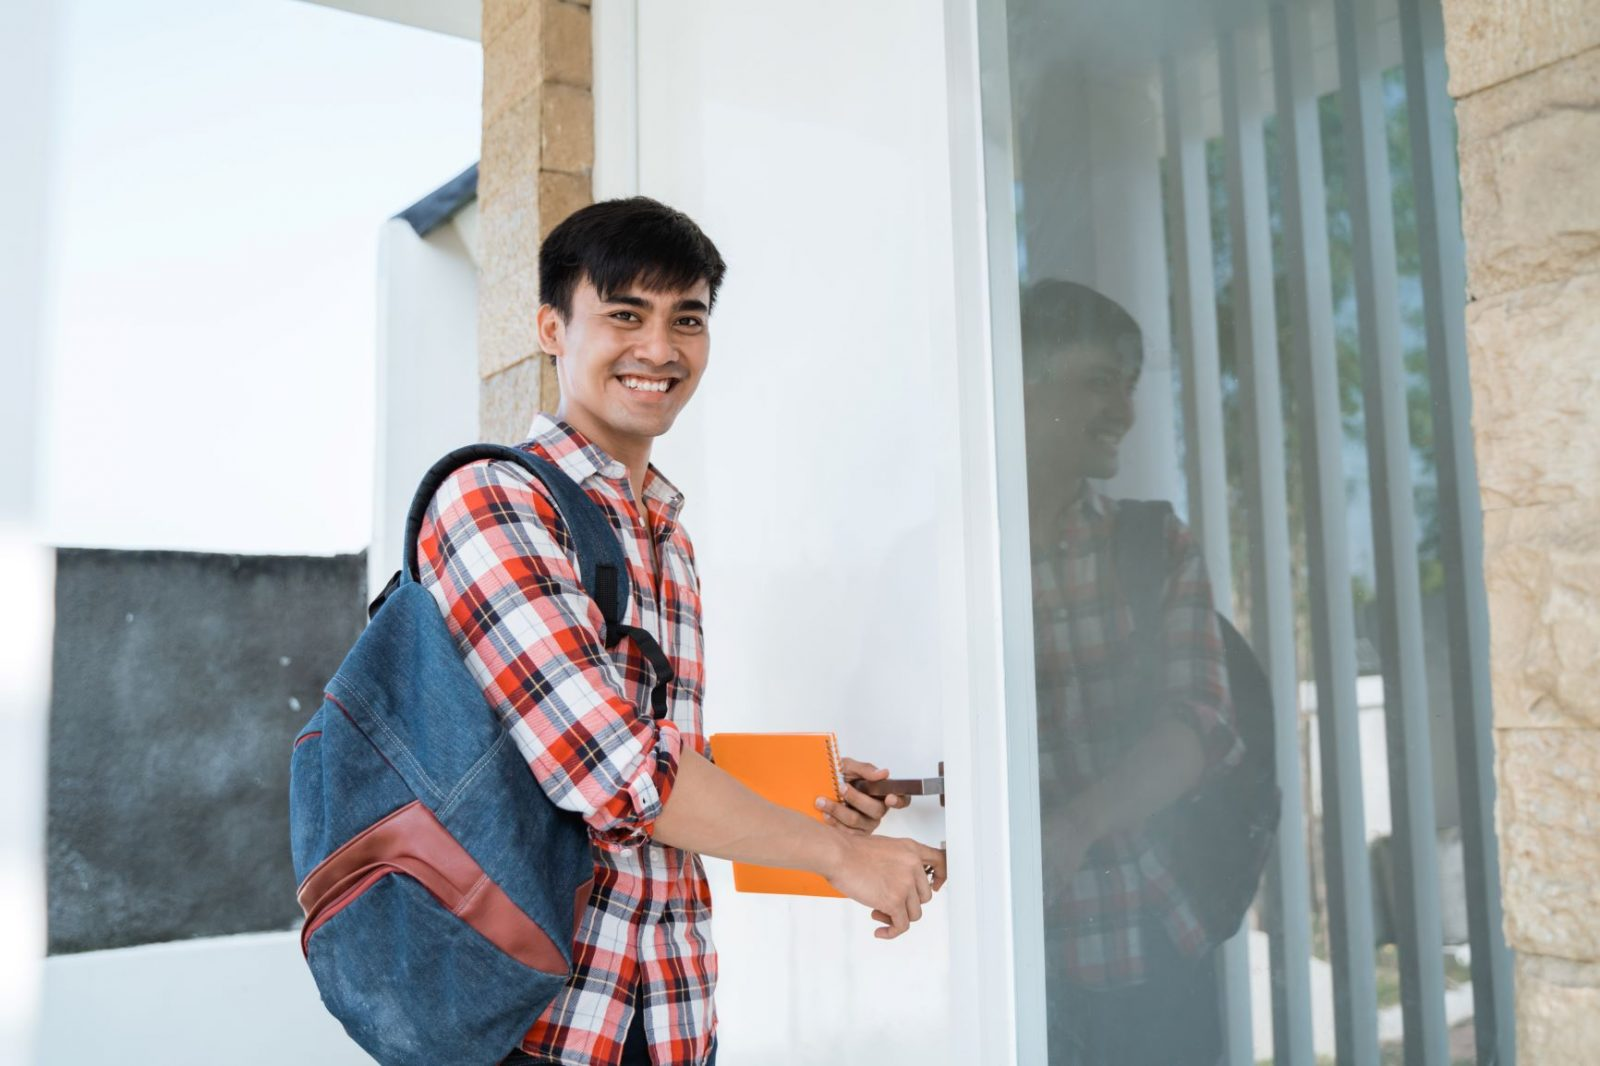 7 Benefits Of Student Housing 3